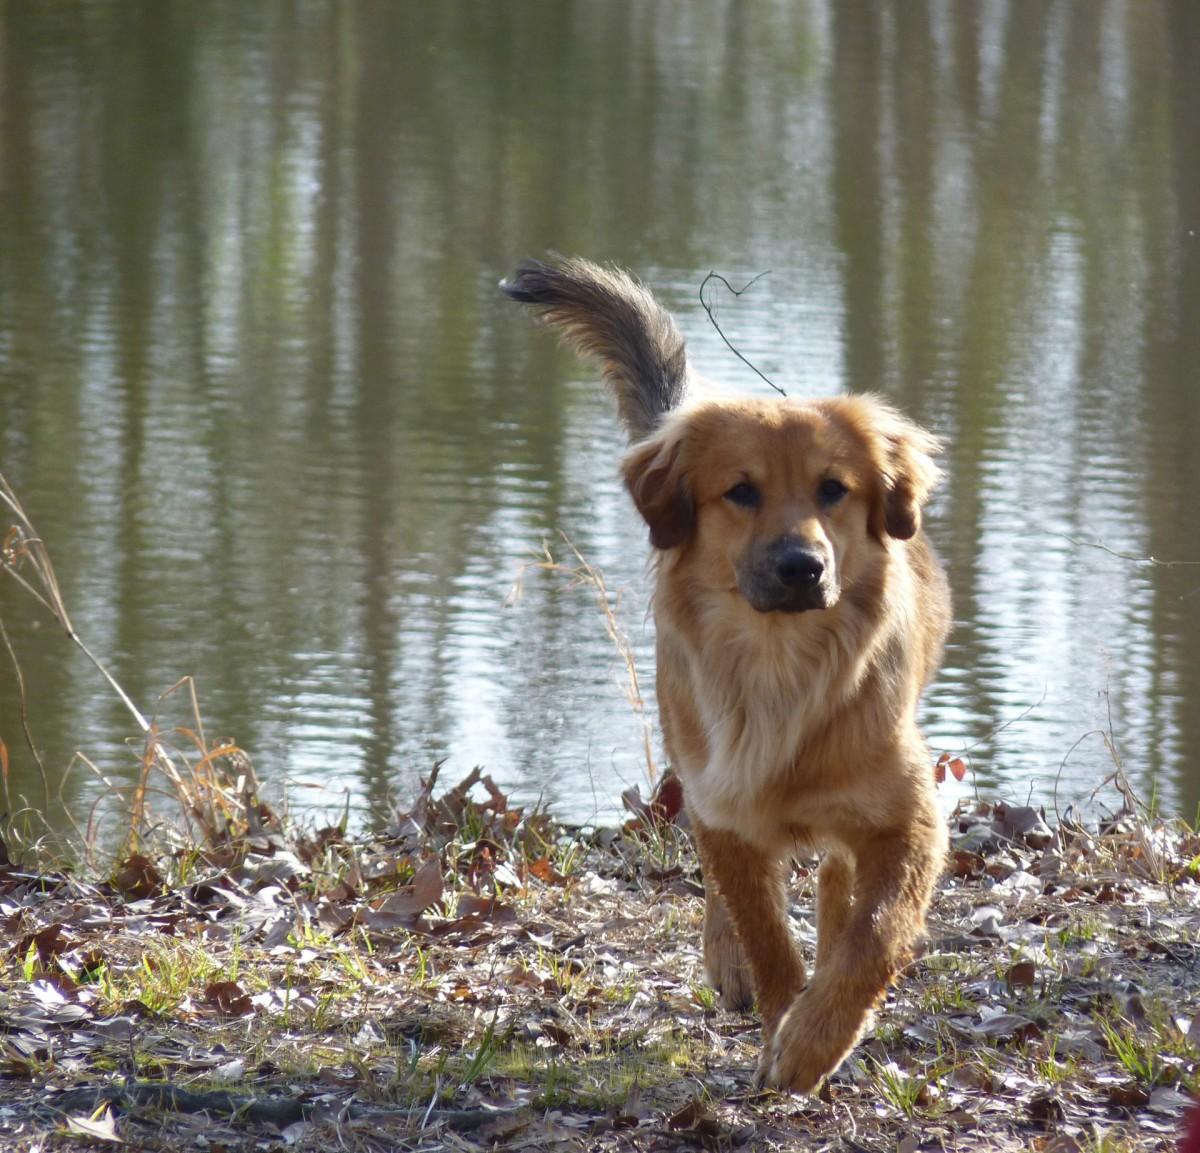 fotos gratis naturaleza perrito perro canino ladrar